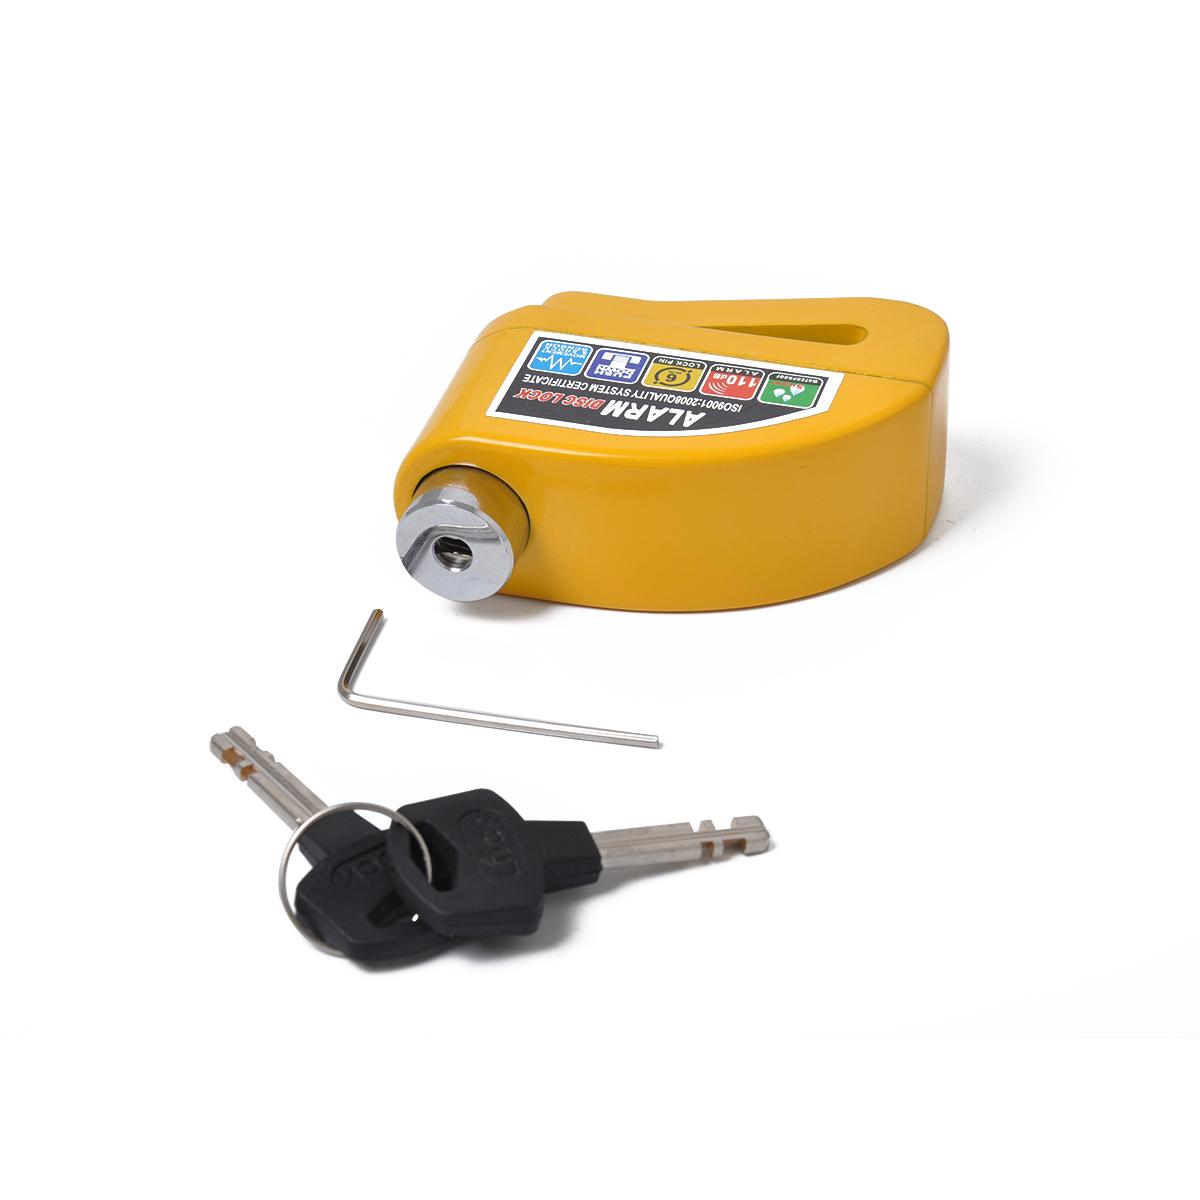 Waterproof Motorcycle Lock Bike Lock Security Anti-theft Lock Moto Disc Brake Lock Kit Yellow-aluminum alloy disc brake lock